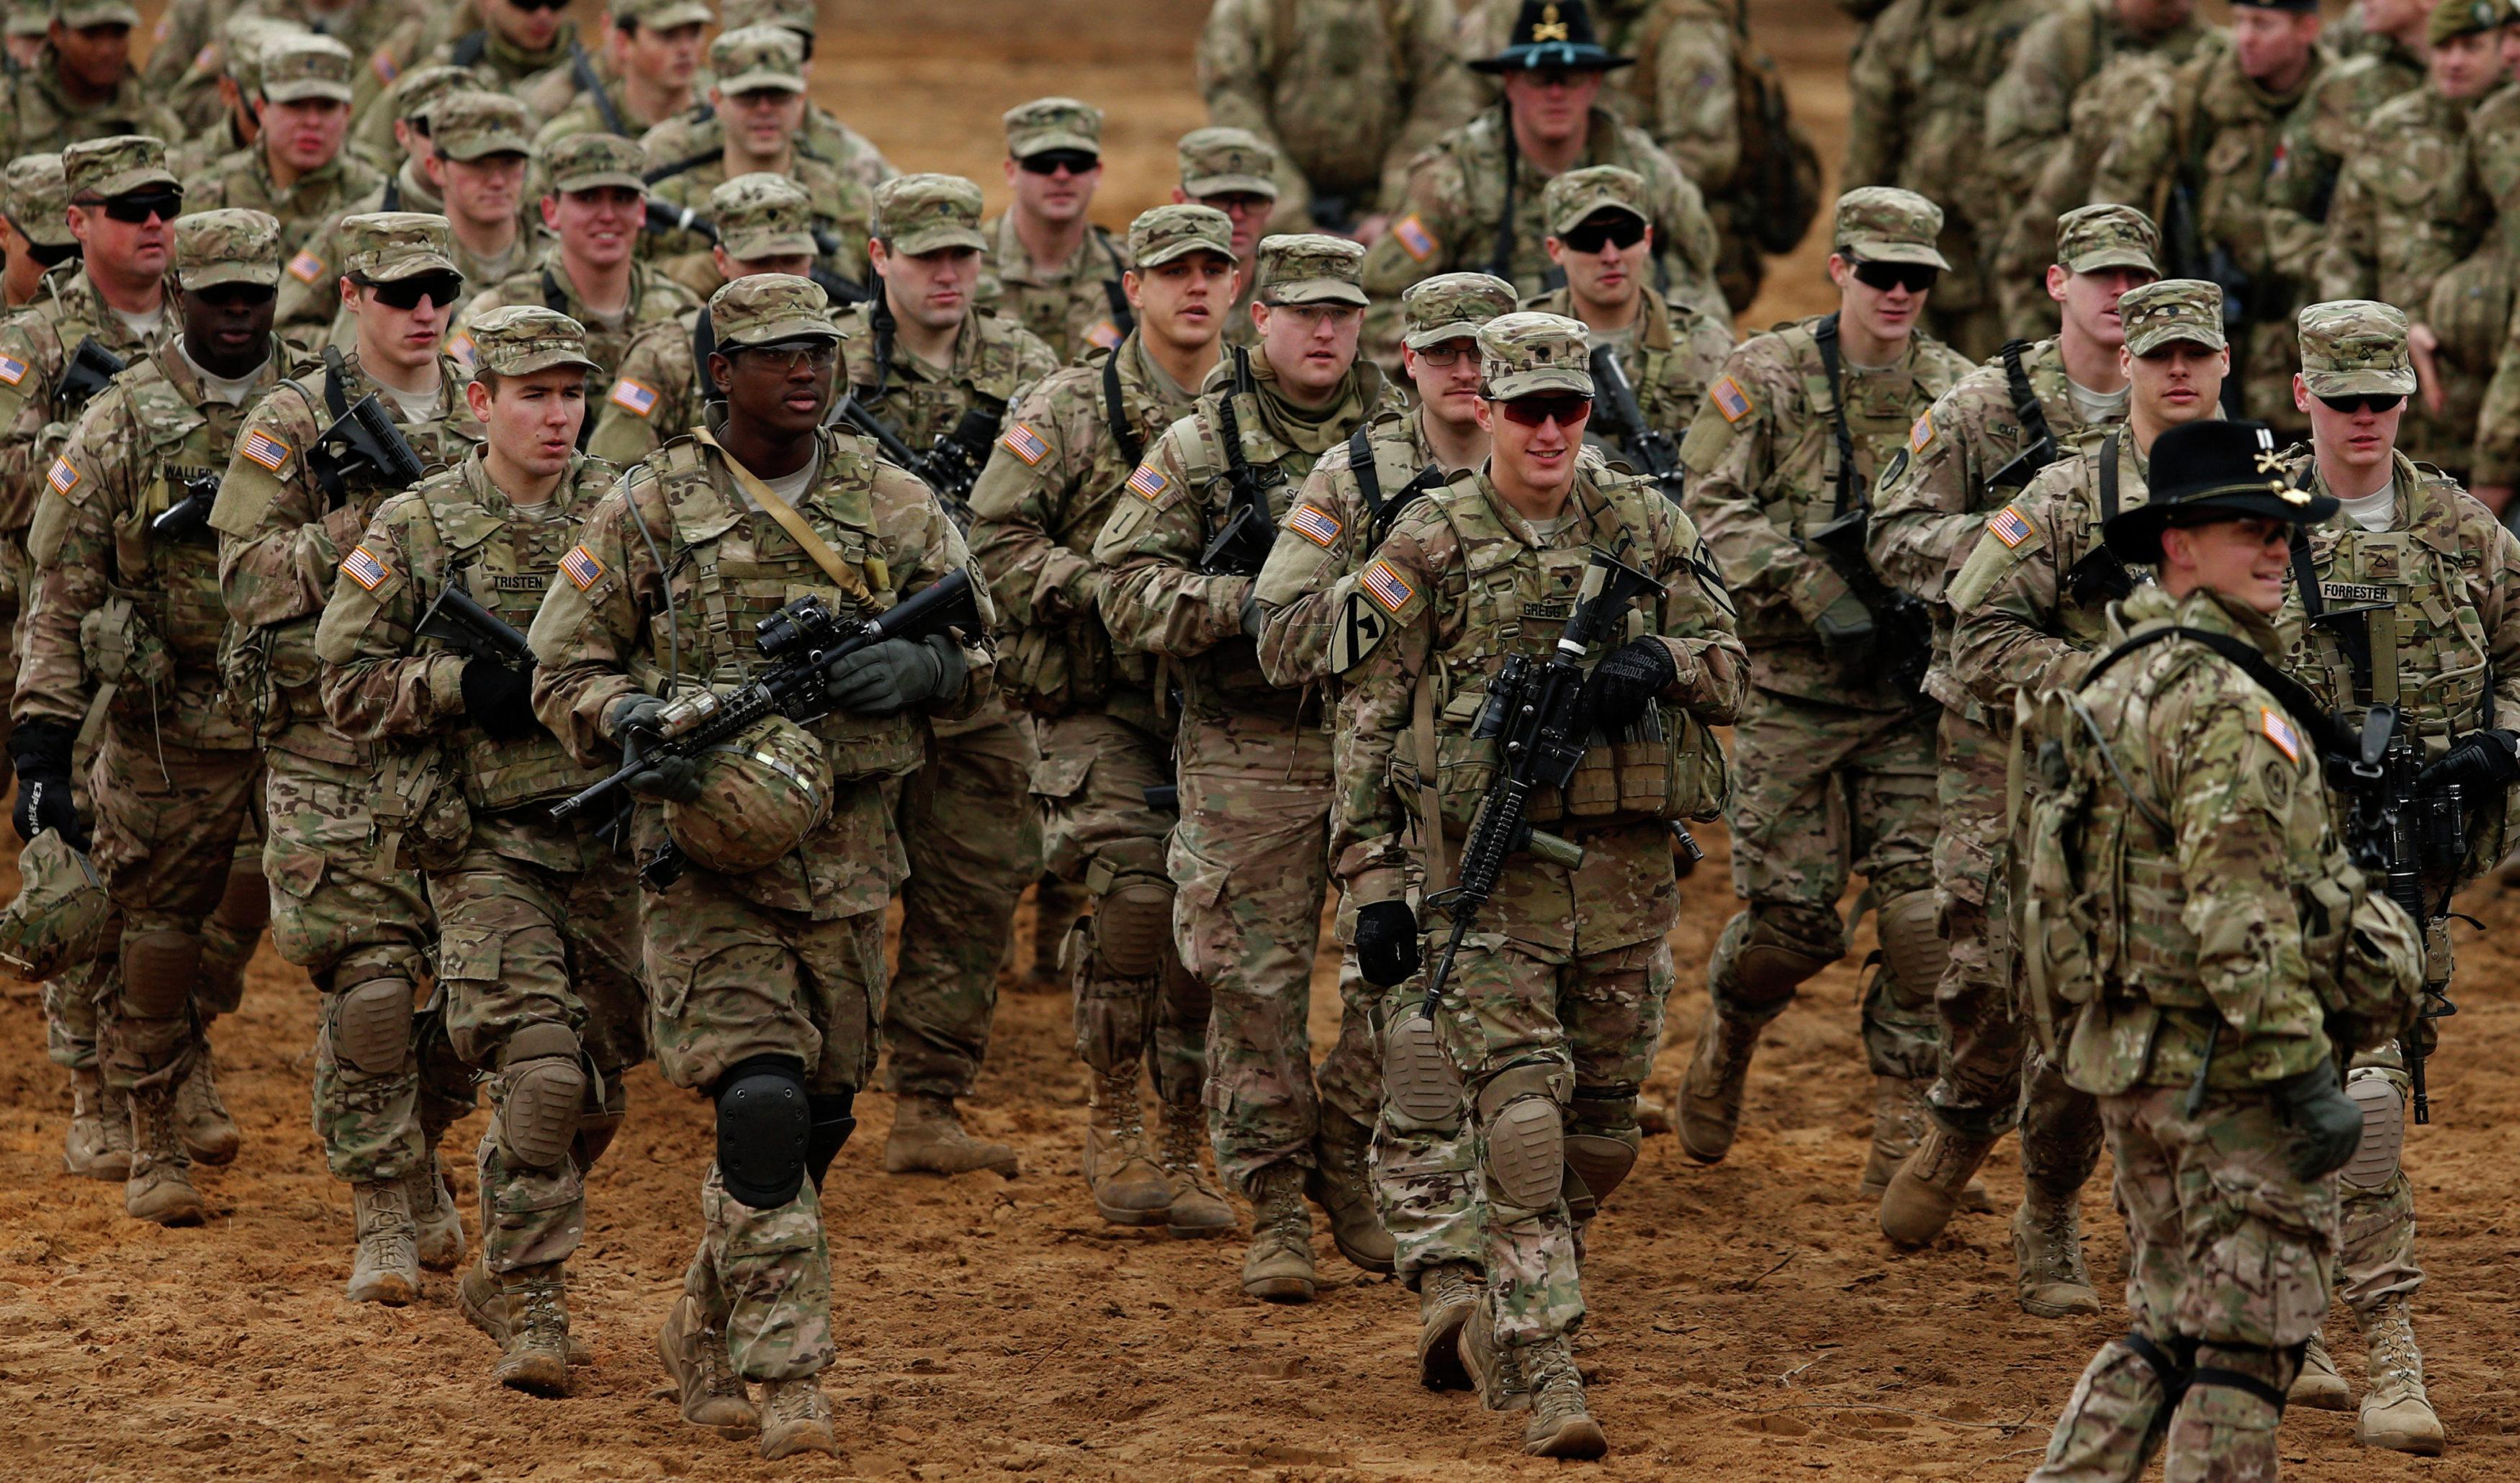 military-members-3500x2060.jpg